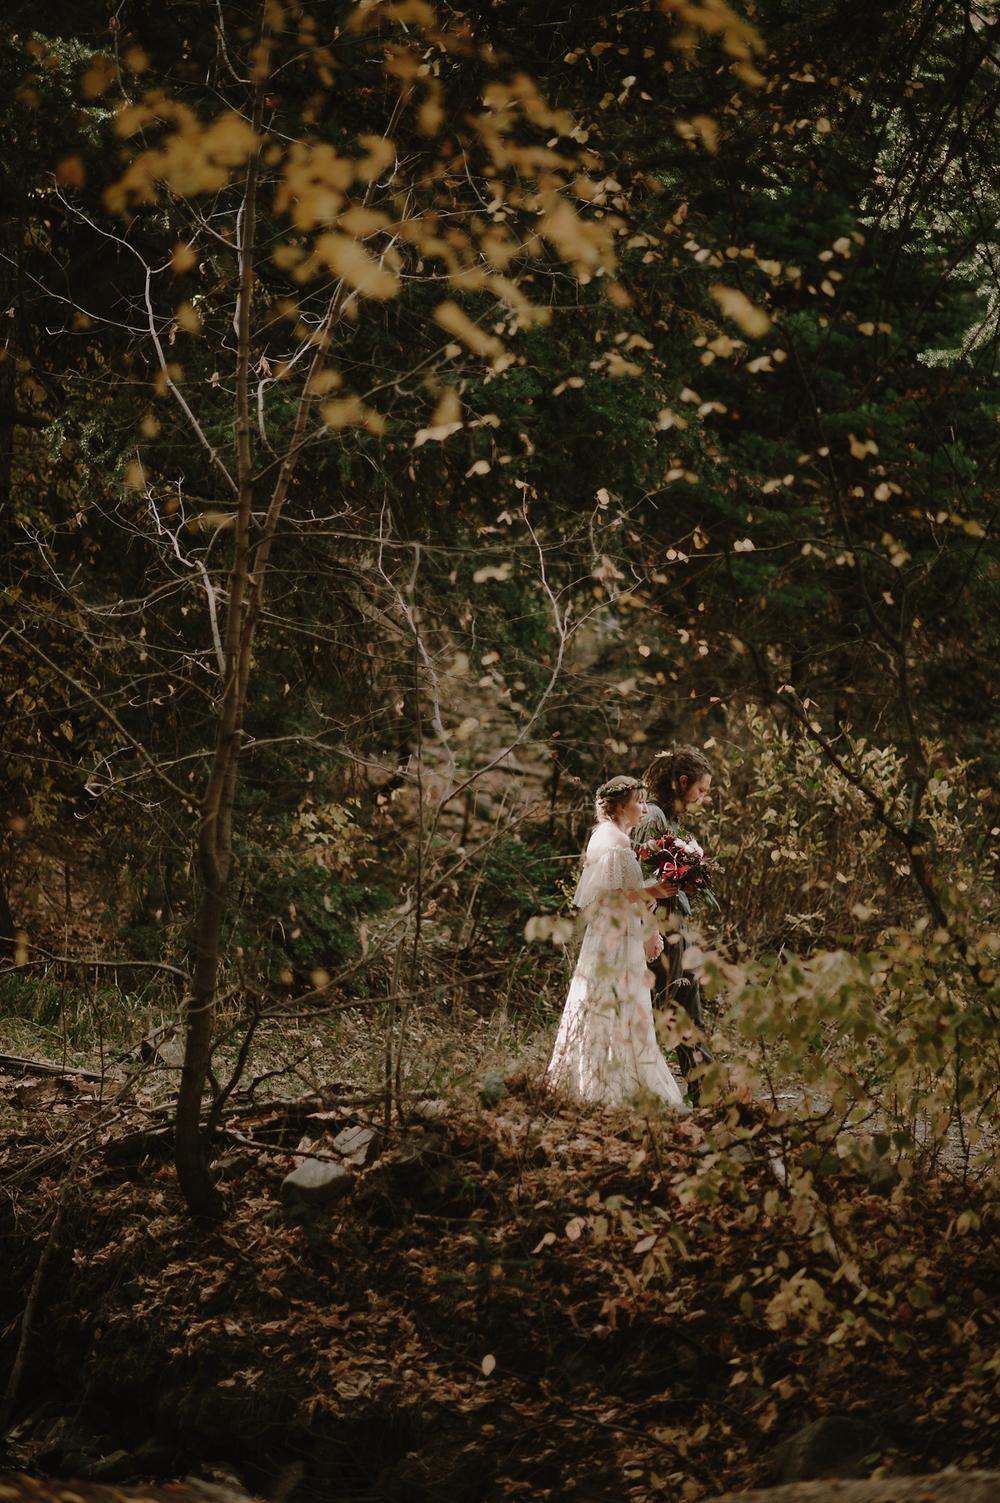 UtahWeddingElopementPhotographer_KristenMarieParker-56.jpg